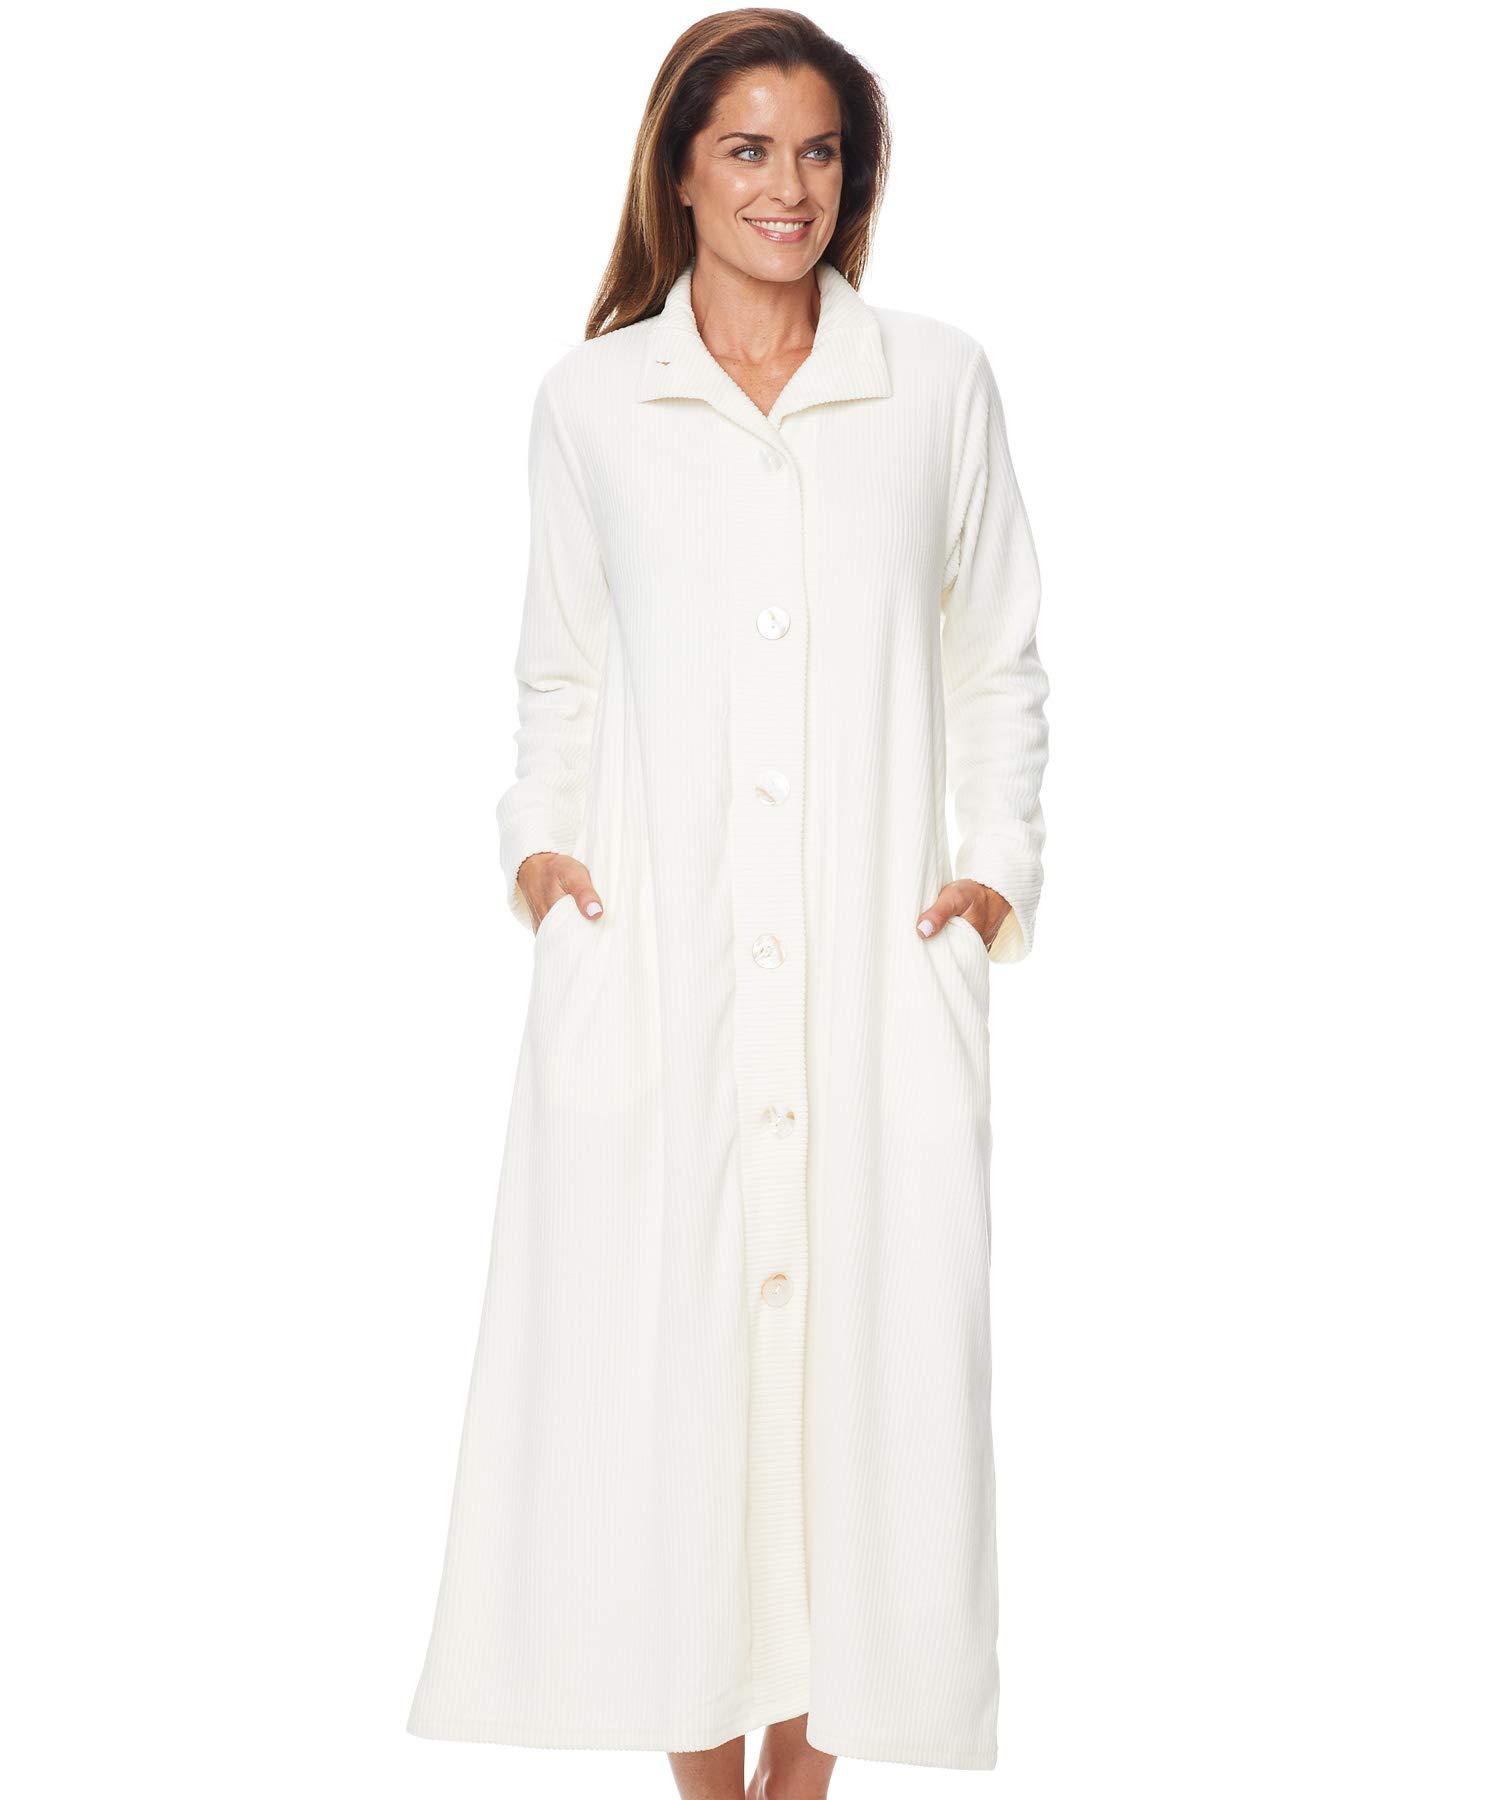 AmeriMark Womens Chenille Long Bath Robe Lounger Sleepwear with Big Buttons Ivory 2X(20W-22W) by AmeriMark